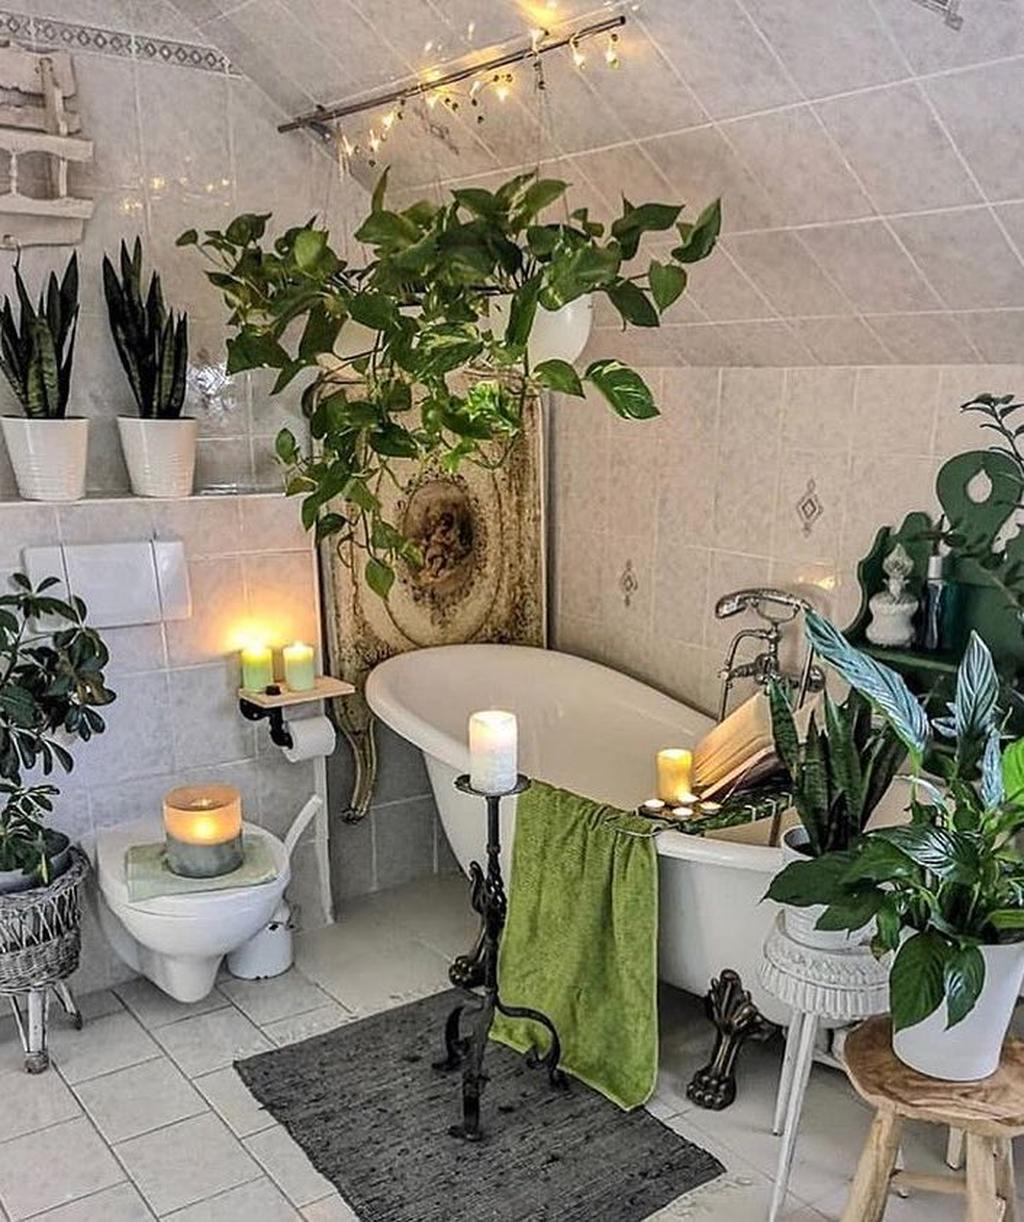 Top Jungle Bathroom Ideas